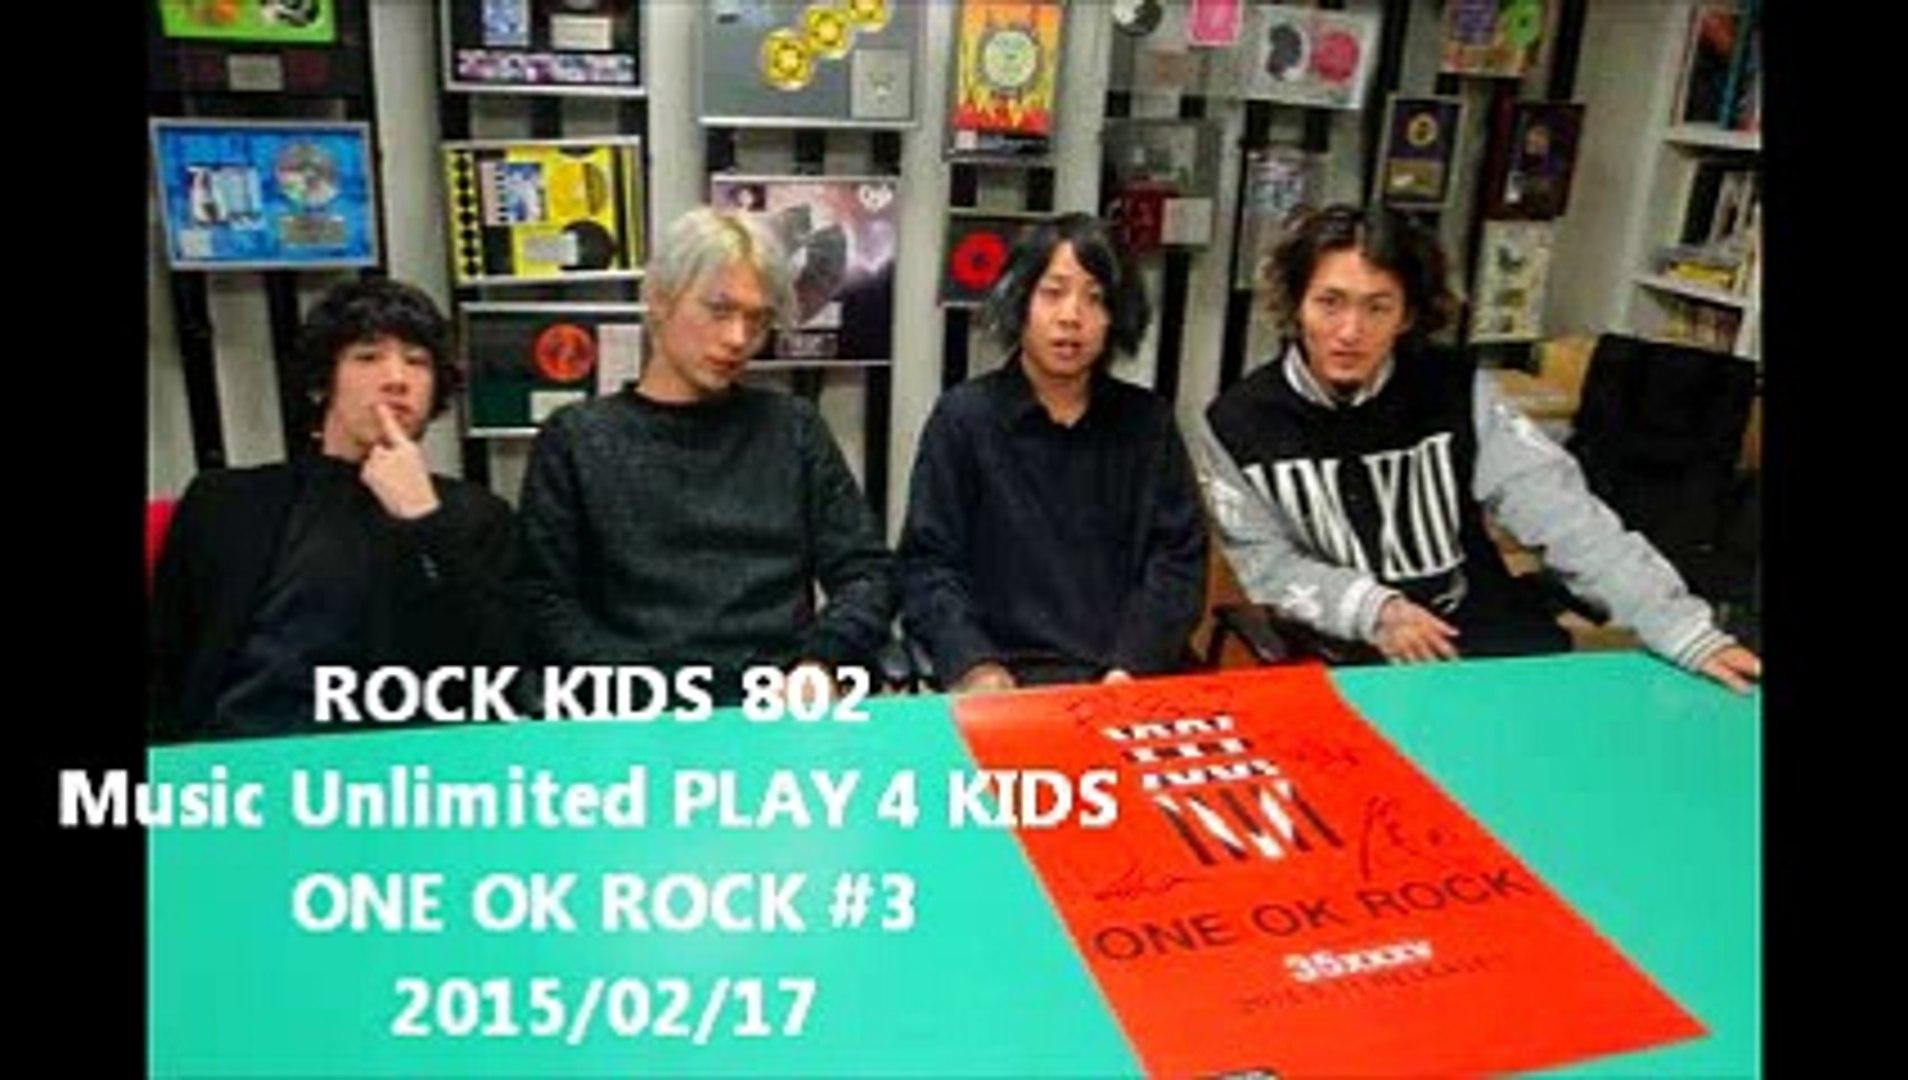 ROCK KIDS 802  PLAY 4 KIDS  ONE OK ROCK #3 2015/02/17